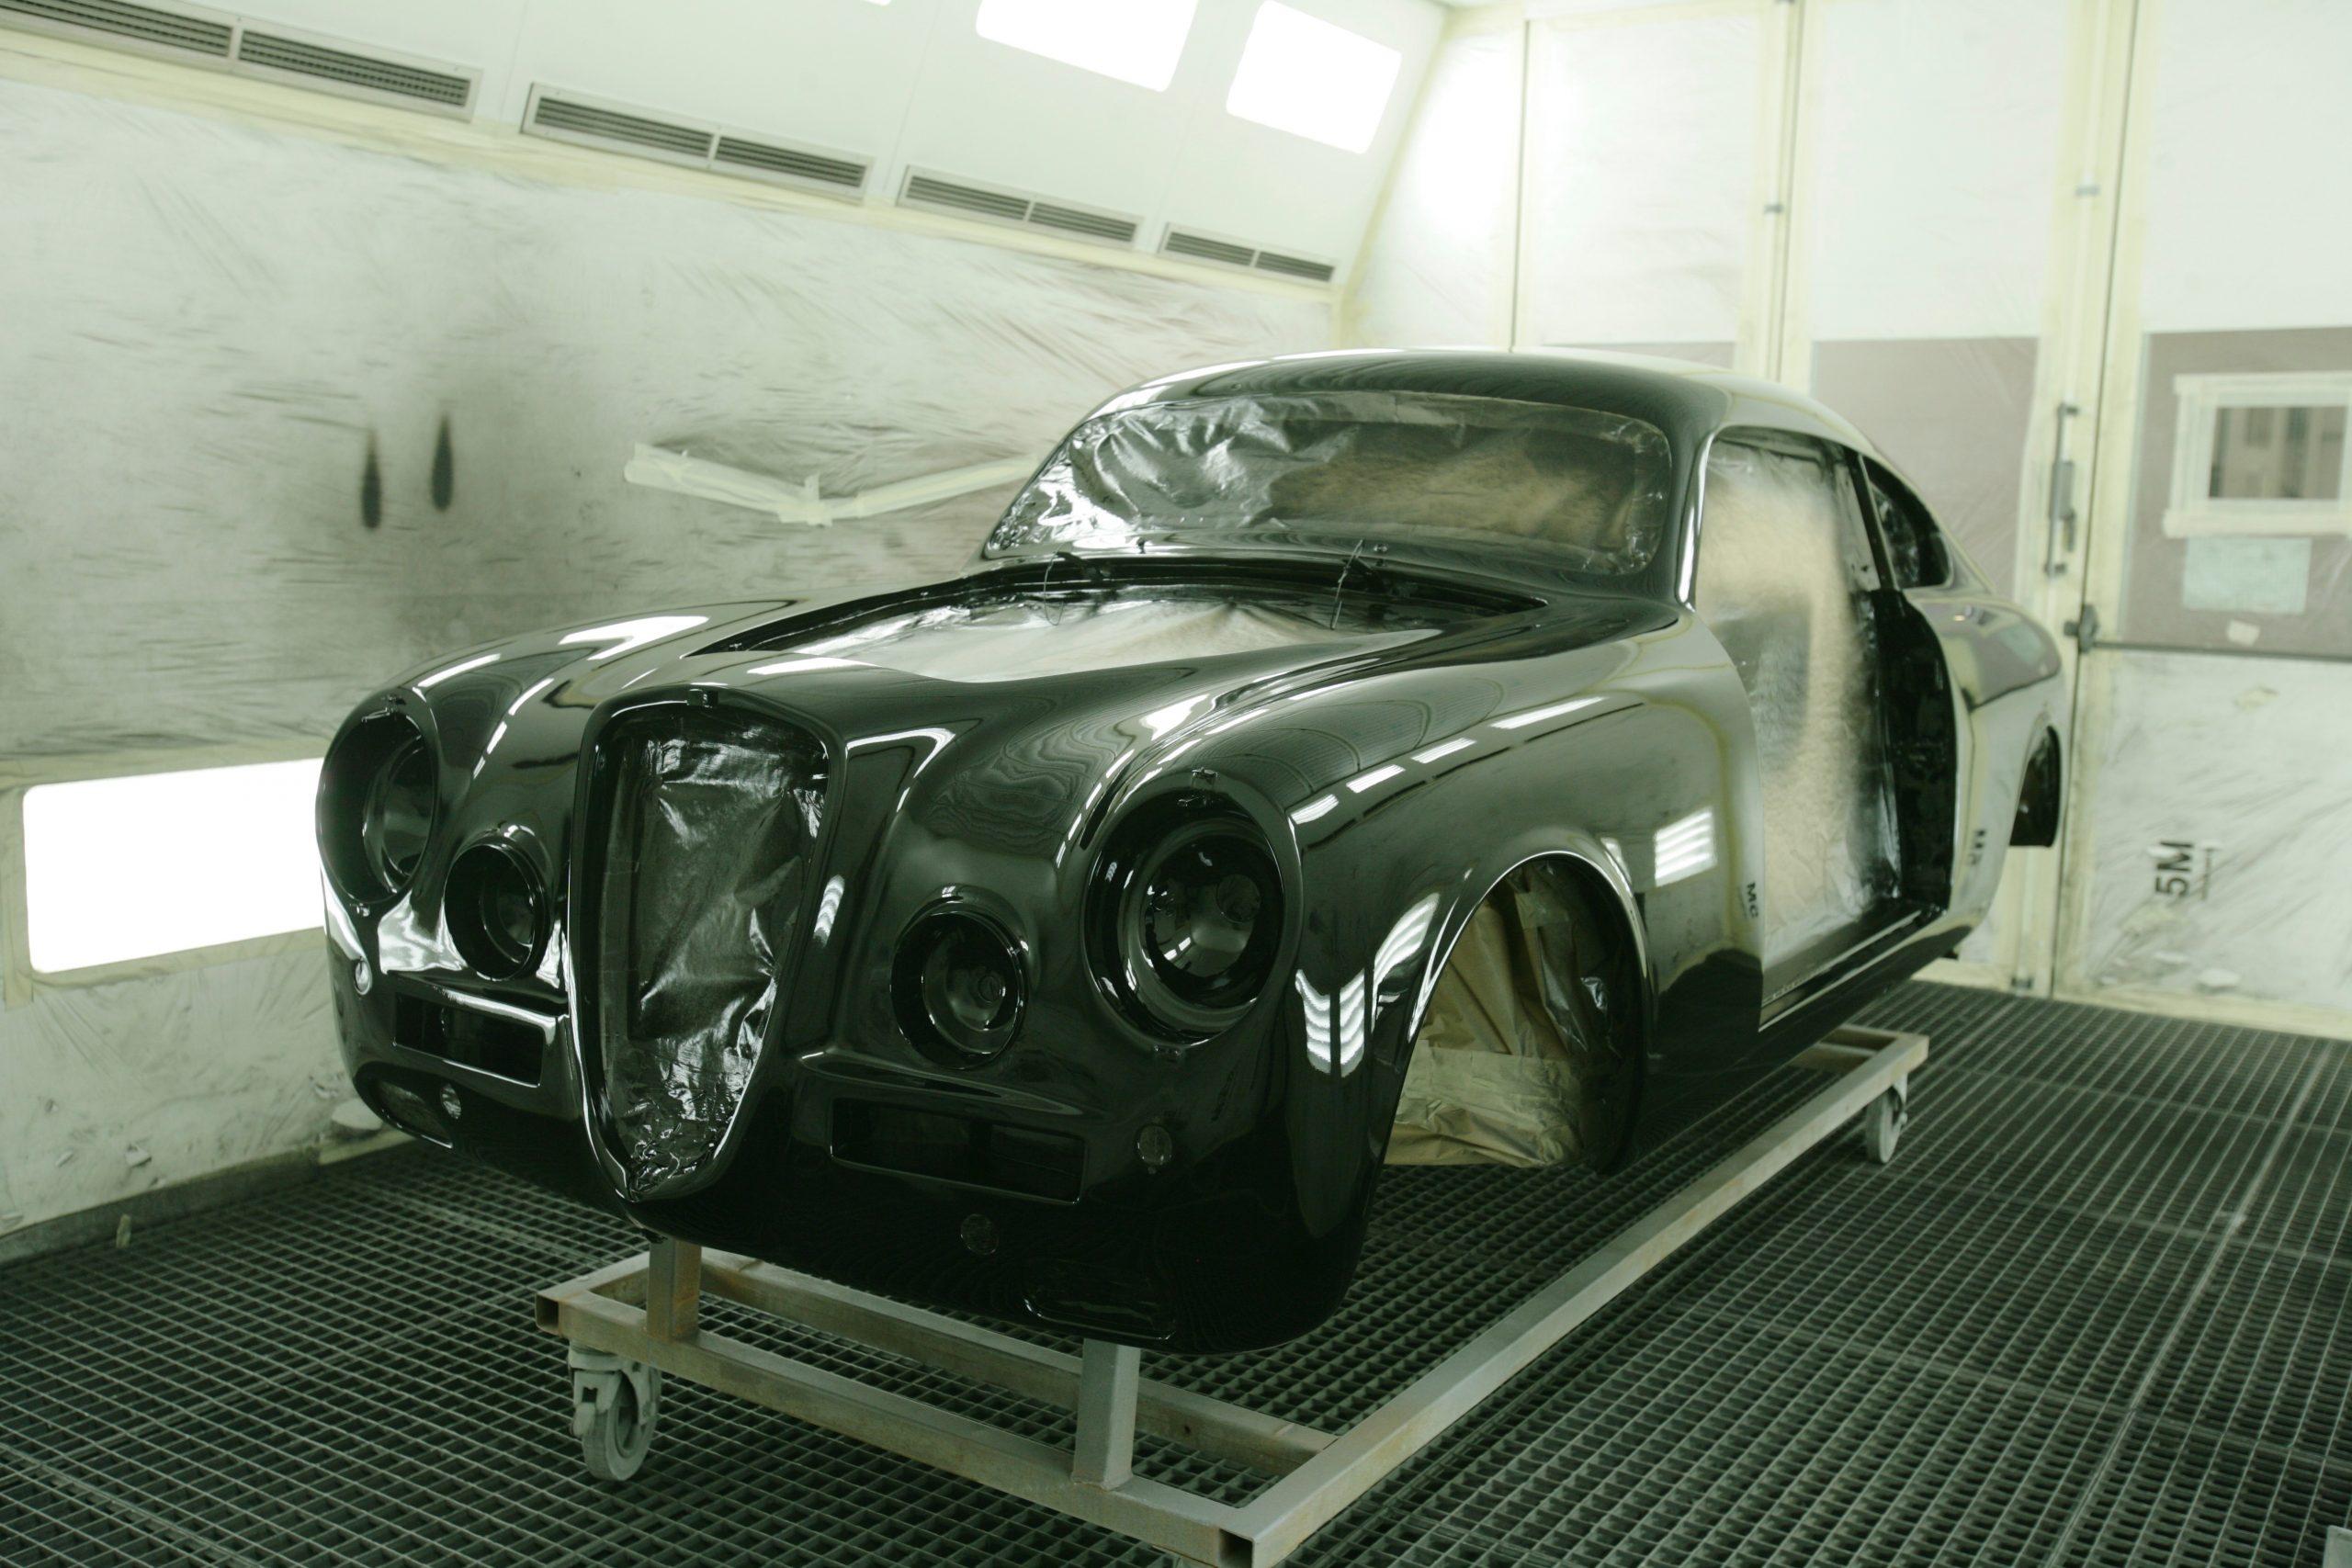 1951 Lancia Aurelia Bracco paint shop